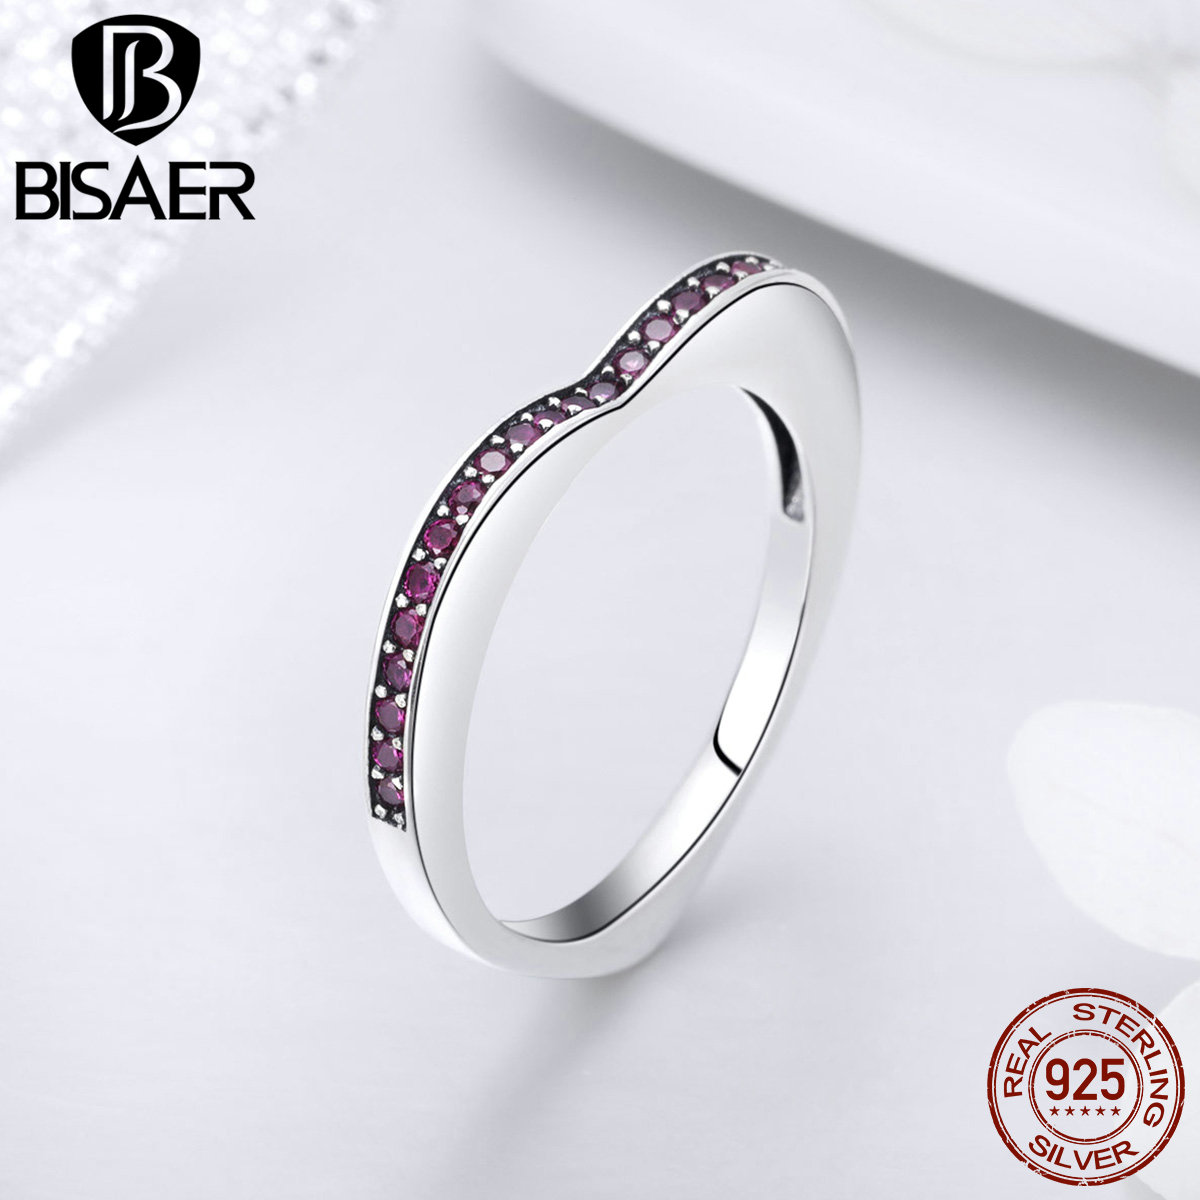 Bisaer 925 Sterling Silver Simple